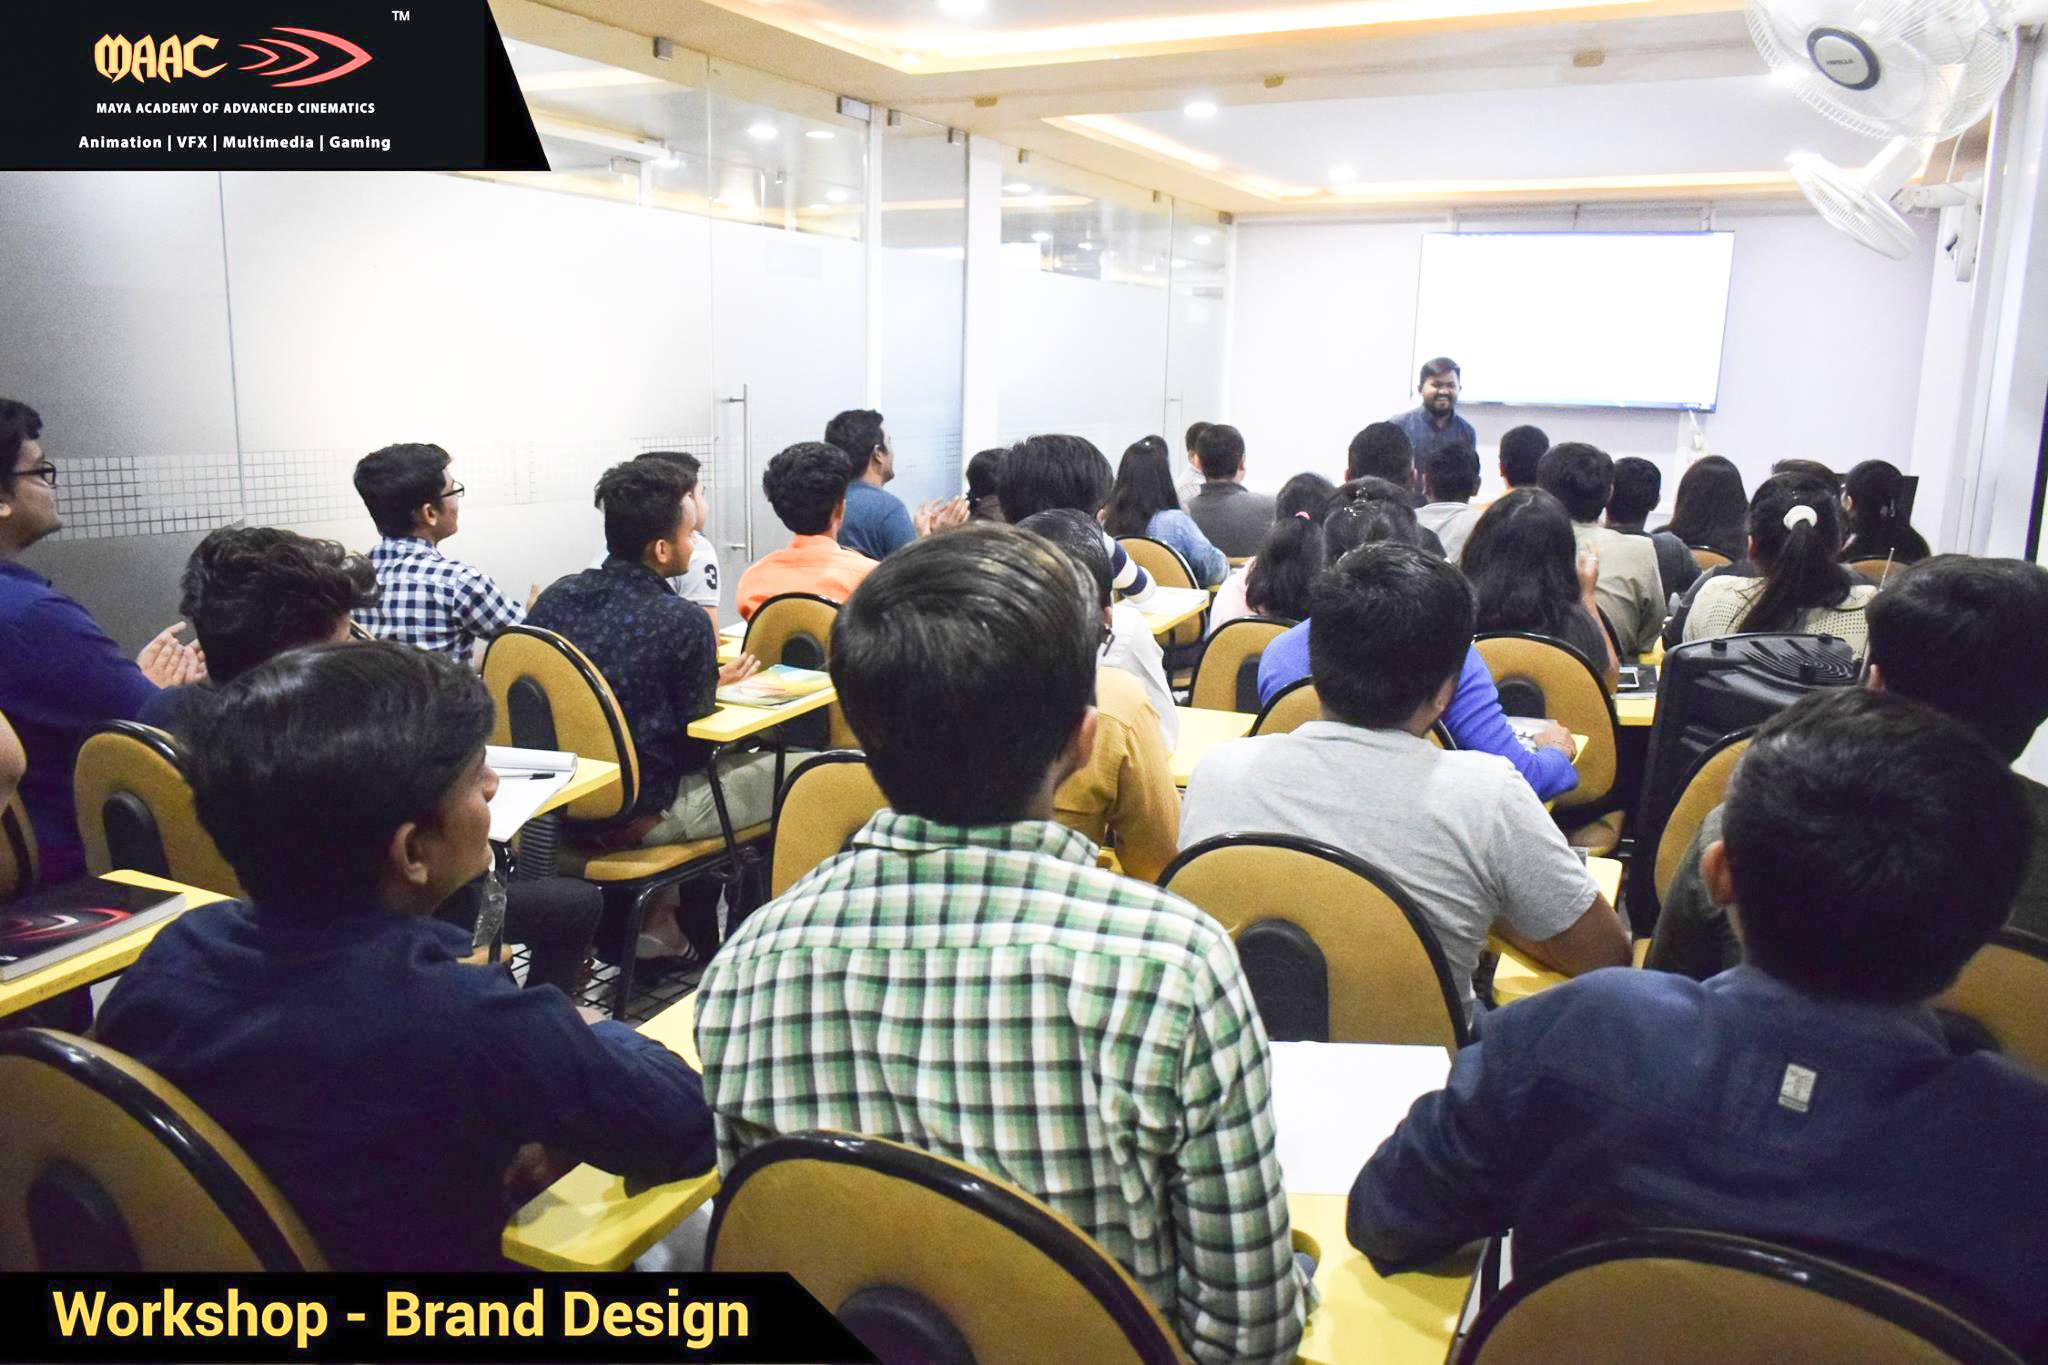 rajkot-event-divyenbhadeshiya